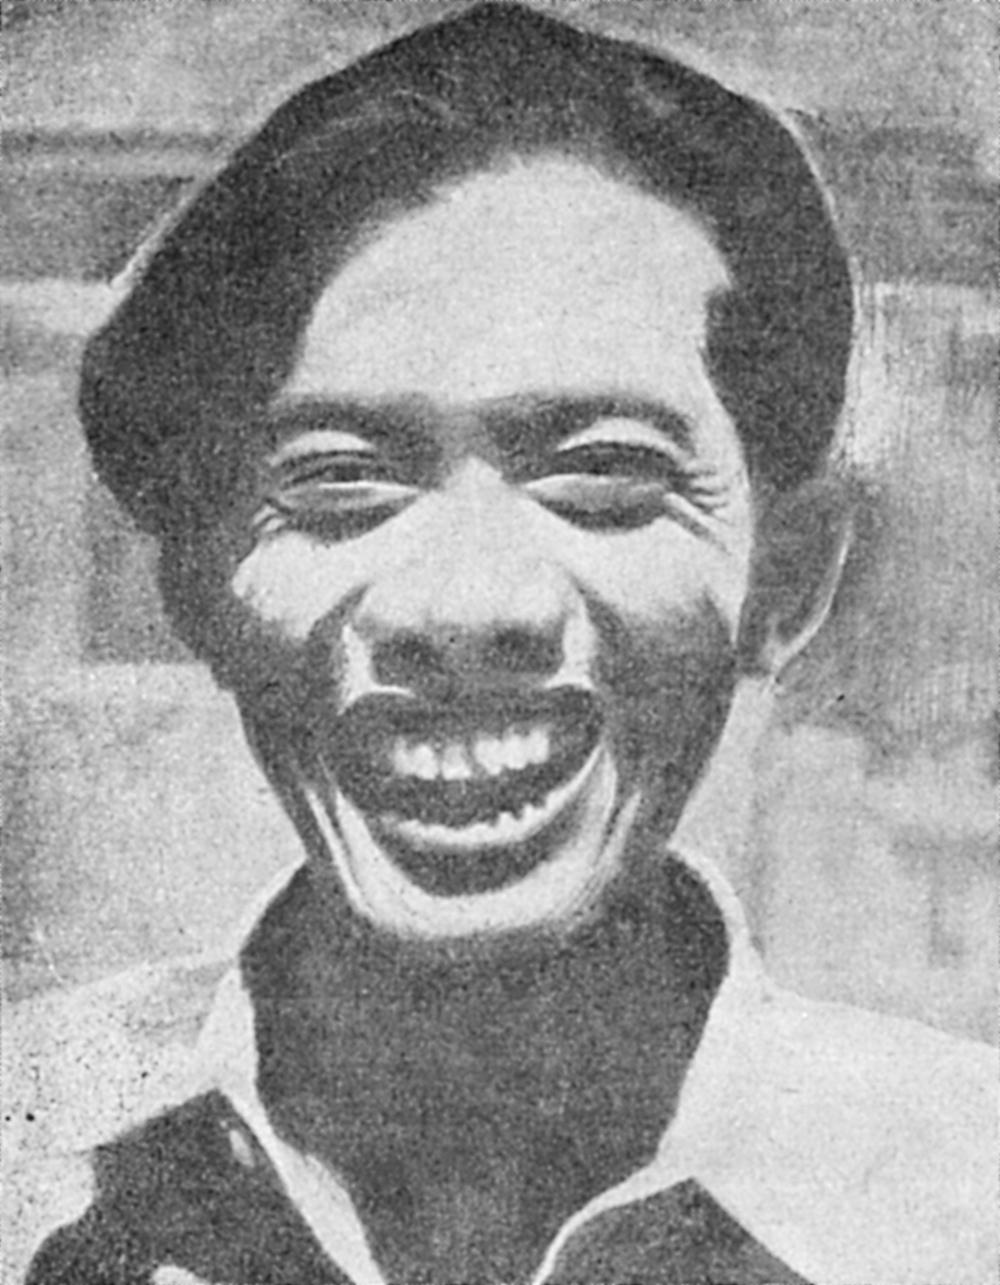 puisi indonesia karya chairil anwar biography